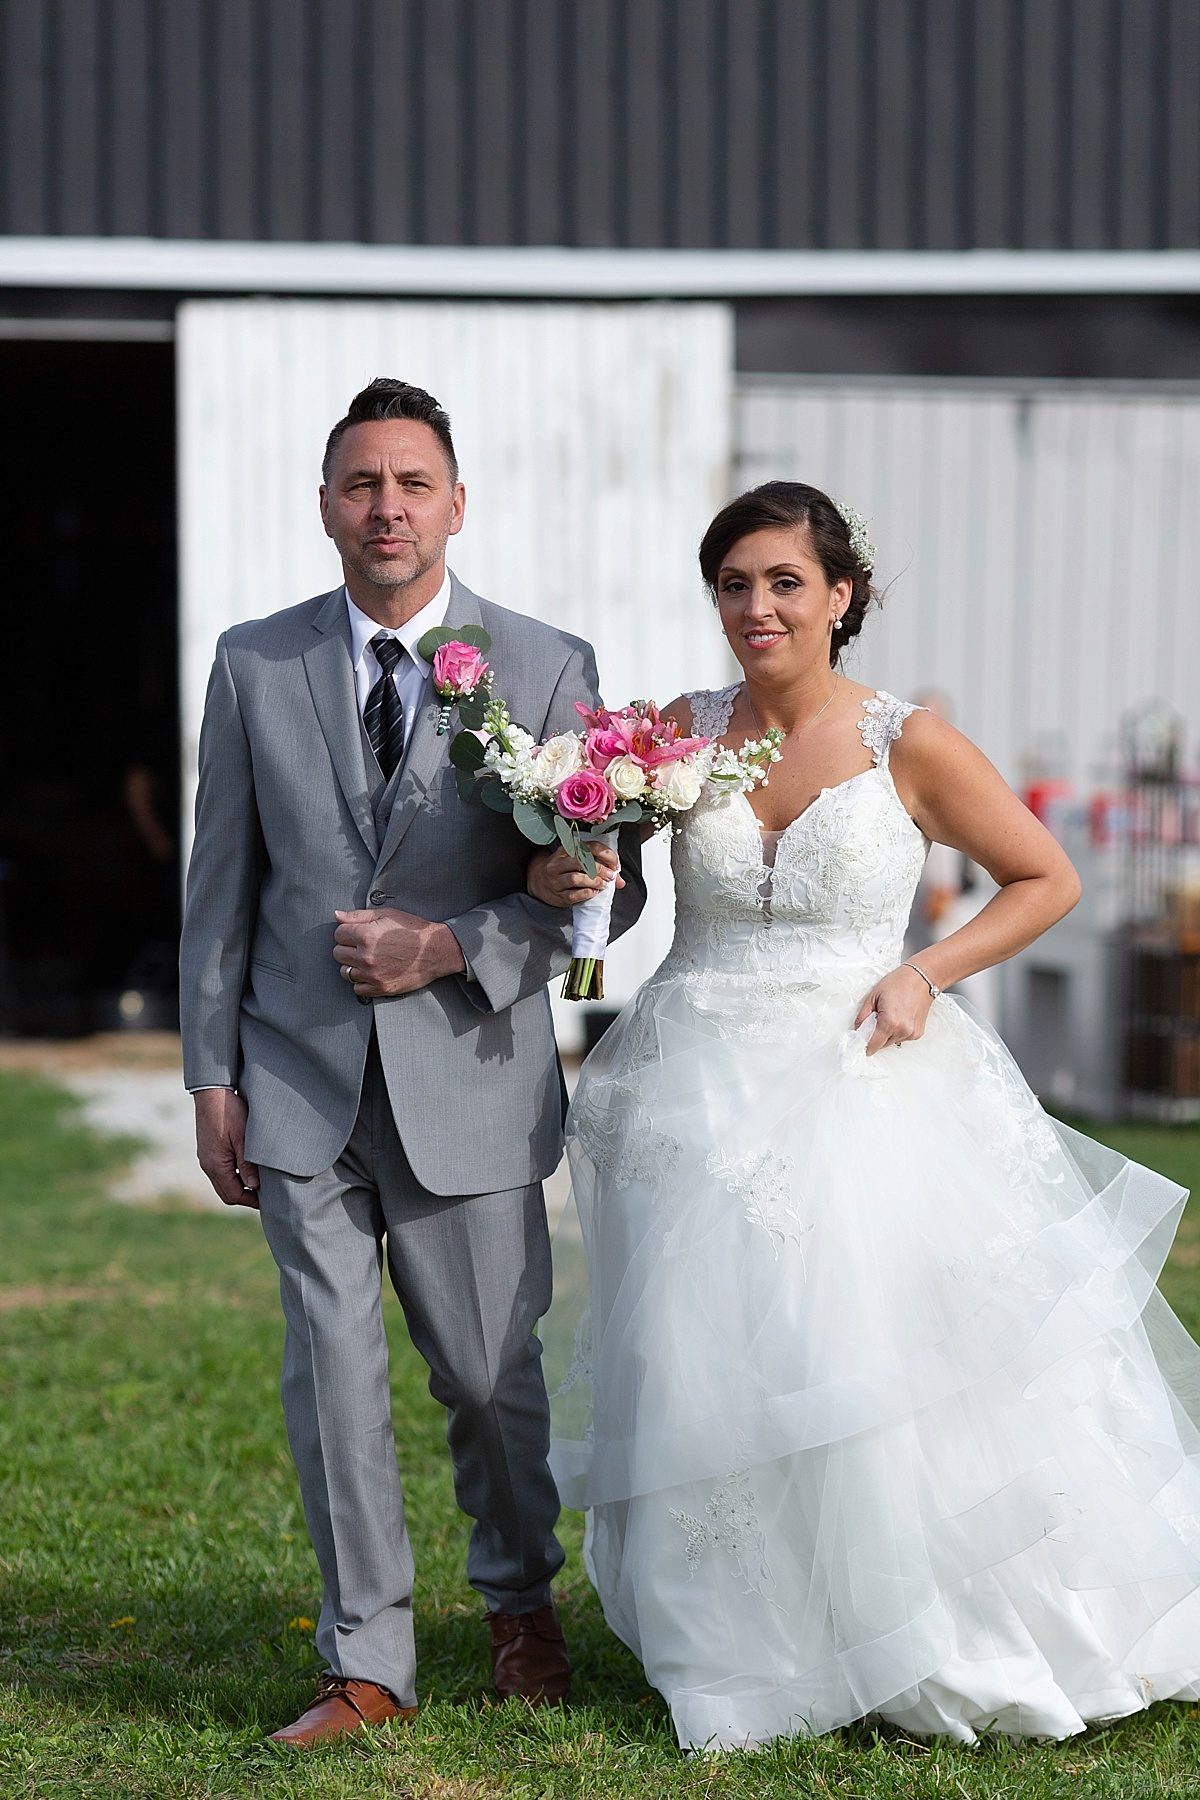 henry-county-wedding-kentucky-farm-spring-wedding-29.JPG